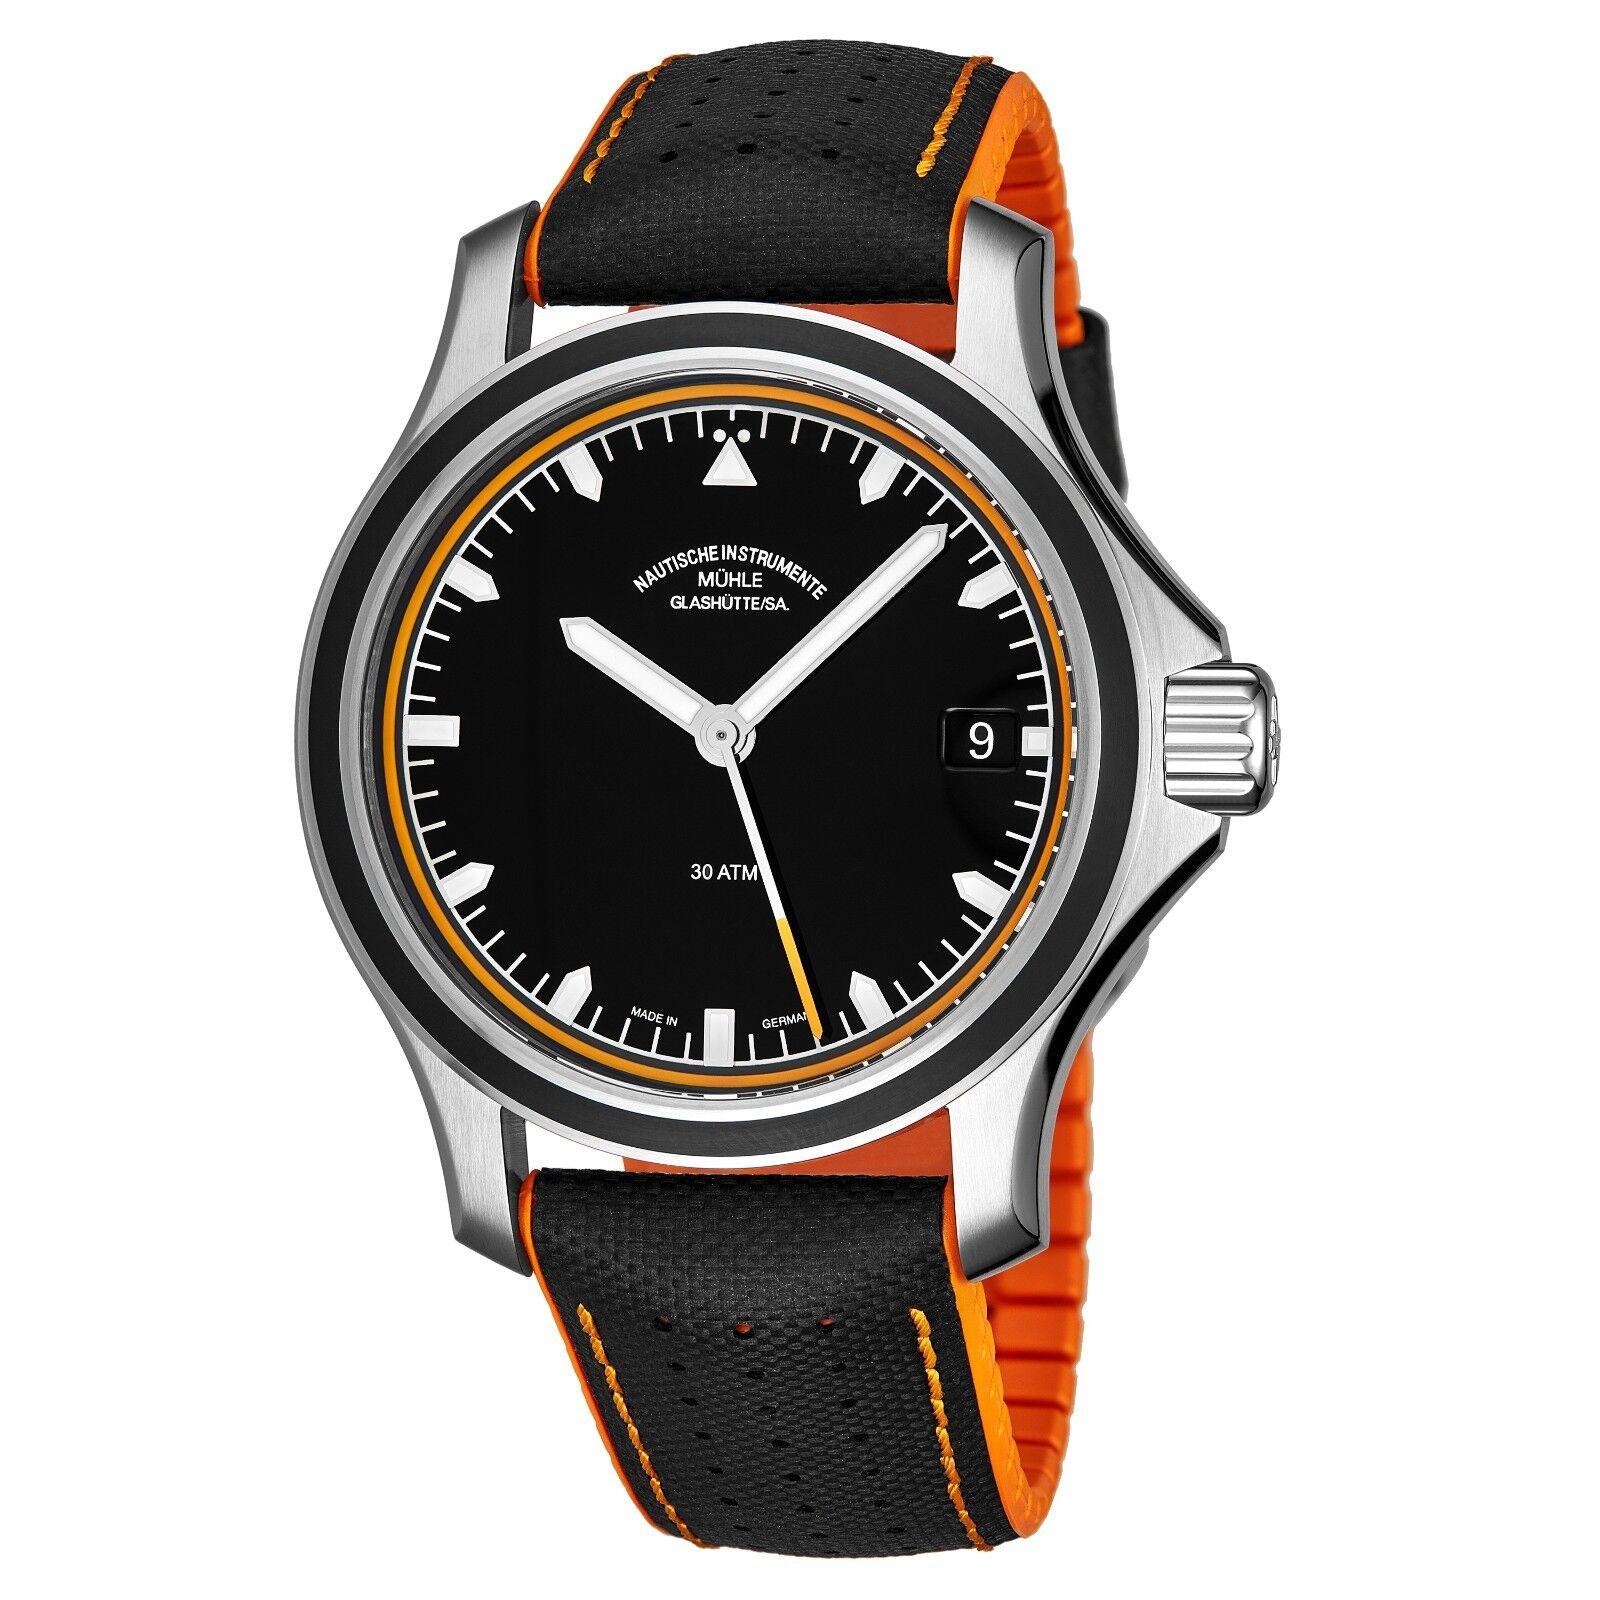 Muhle Glashutte Men's Pro MareDatum Go Rubber Strap Automatic Watch M1-42-13-NB - watch picture 1